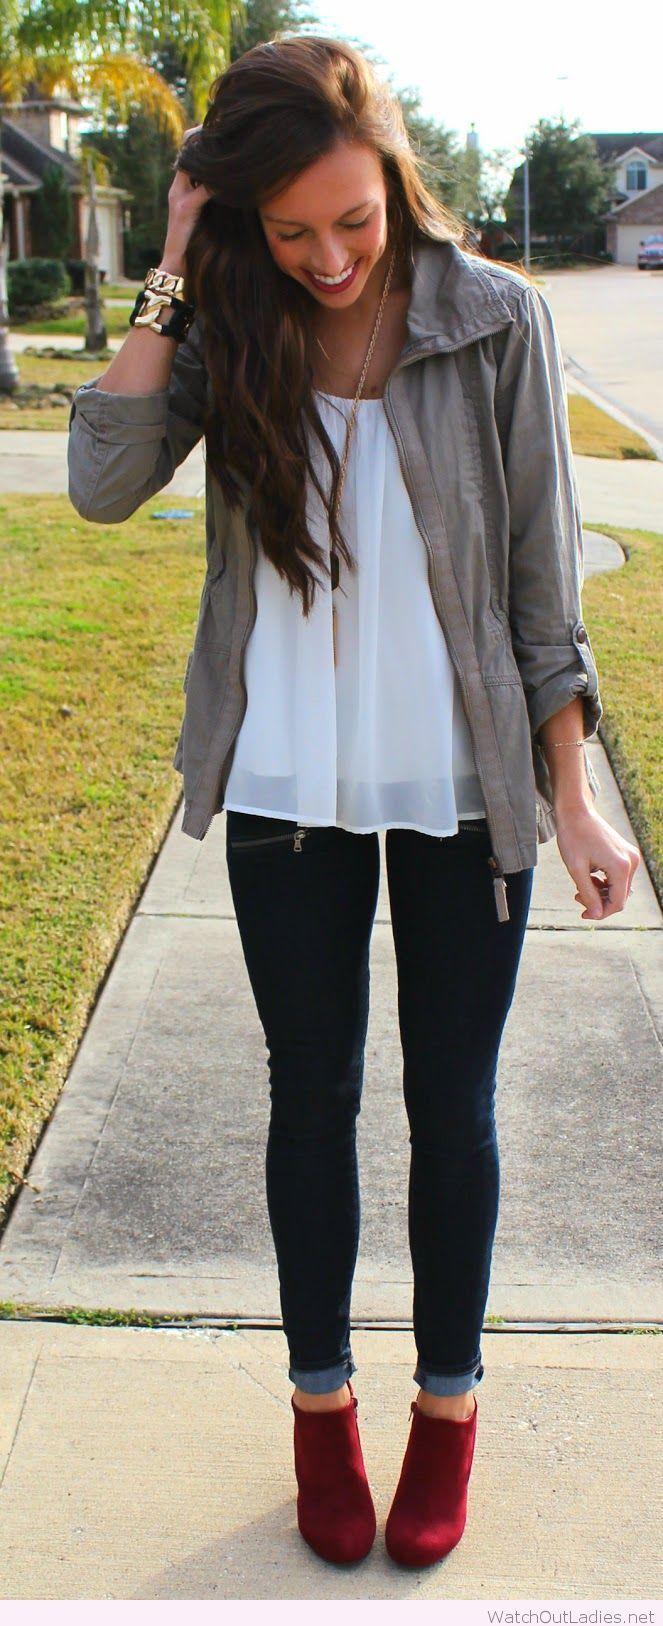 Black pants, white tee and grey jacket